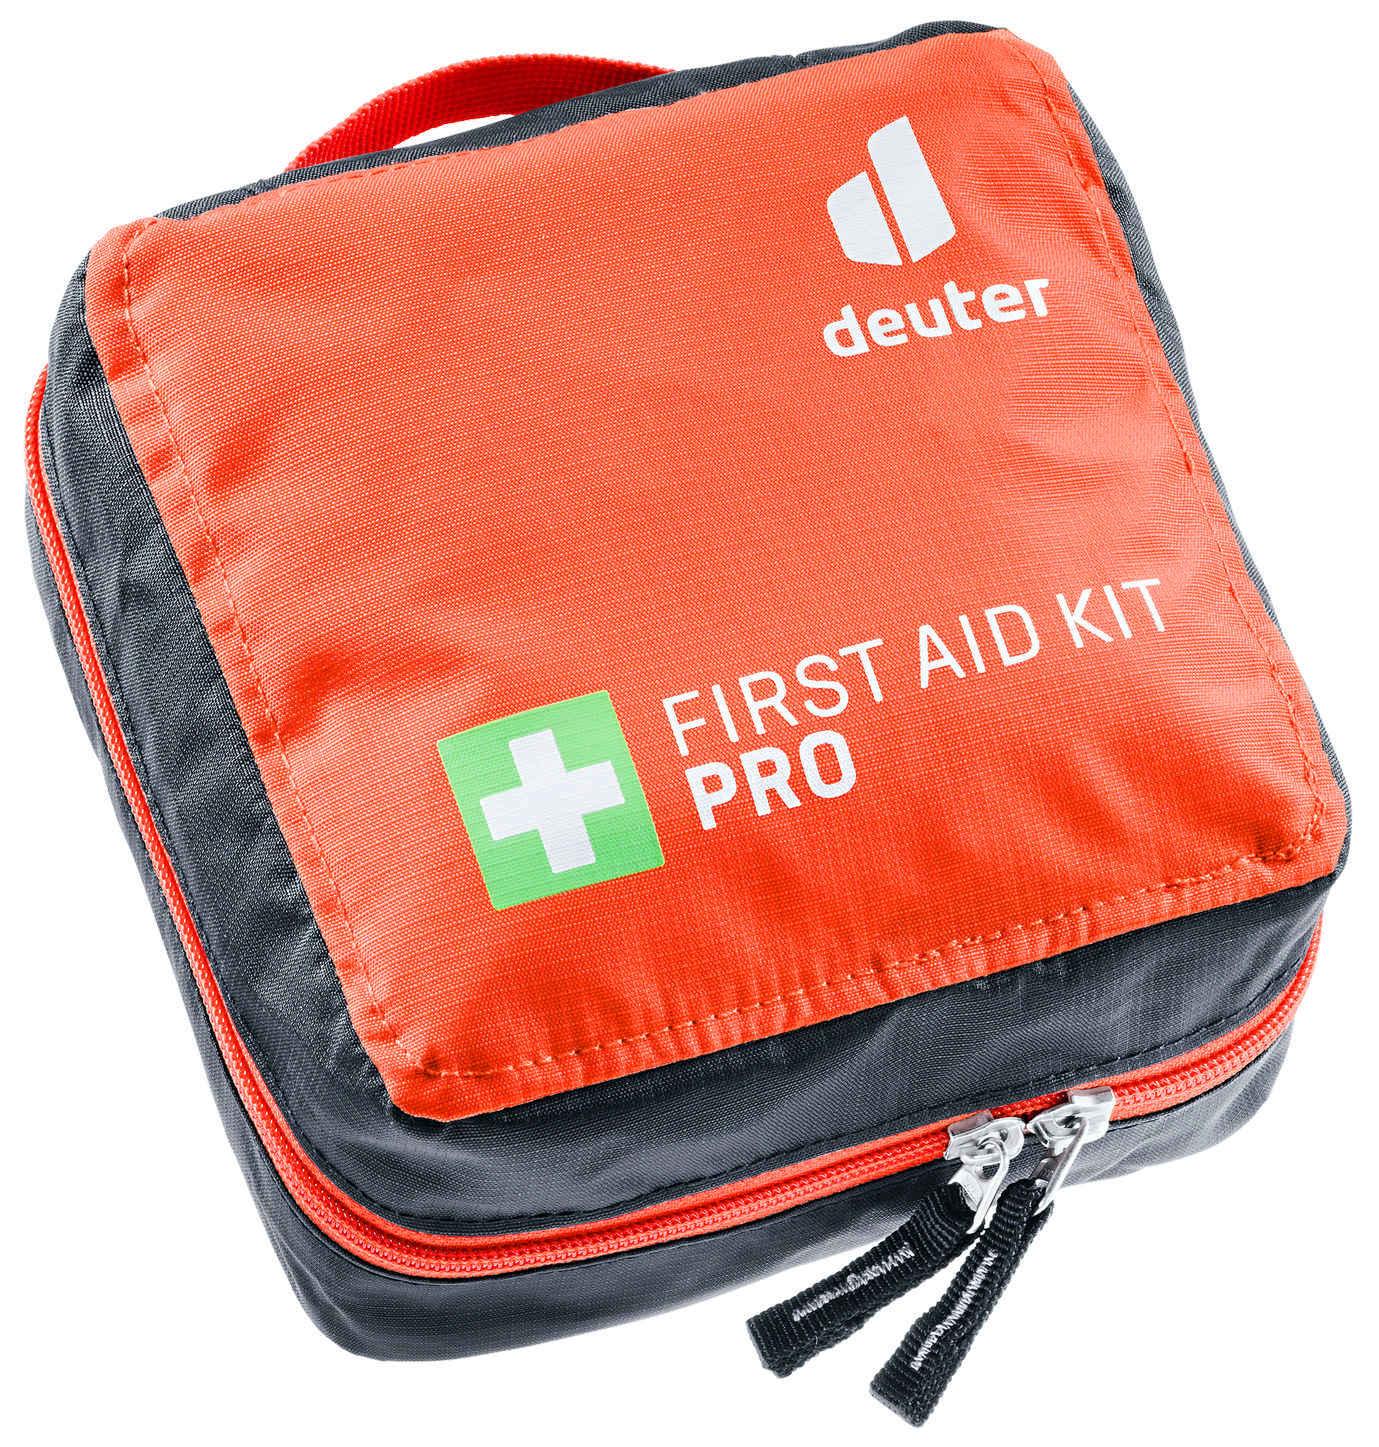 Аптечки Аптечка туристическая Deuter First Aid Kit Pro (без наполнения) (2021) 3970221-9002-FirstAidKitPro-s21-d0.jpg